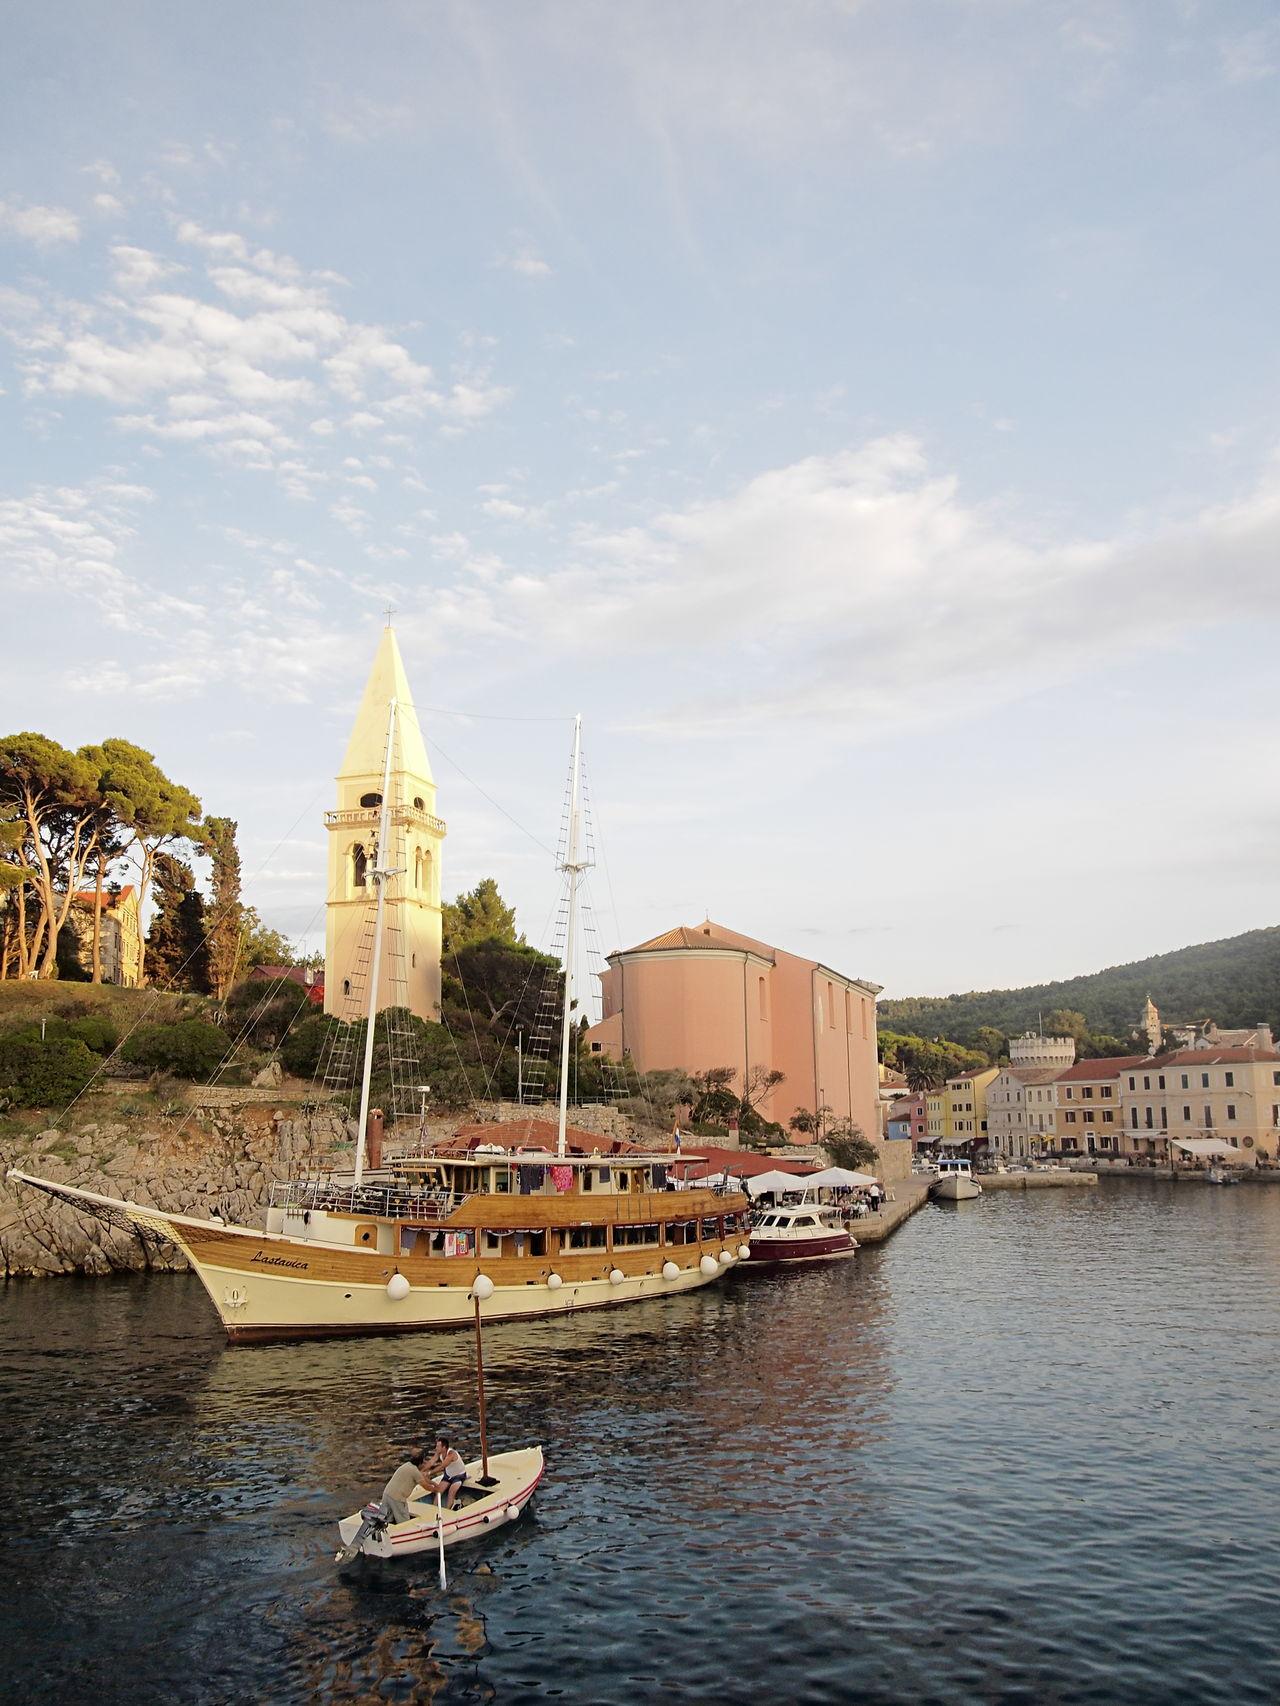 Architecture Building Exterior Church City Clouds Croatia Fresh On Eyeem  Mali Lošinj Nautical Vessel Olympus OlympusPEN Sky Travel Destinations Water Zuiko Zuiko Digital